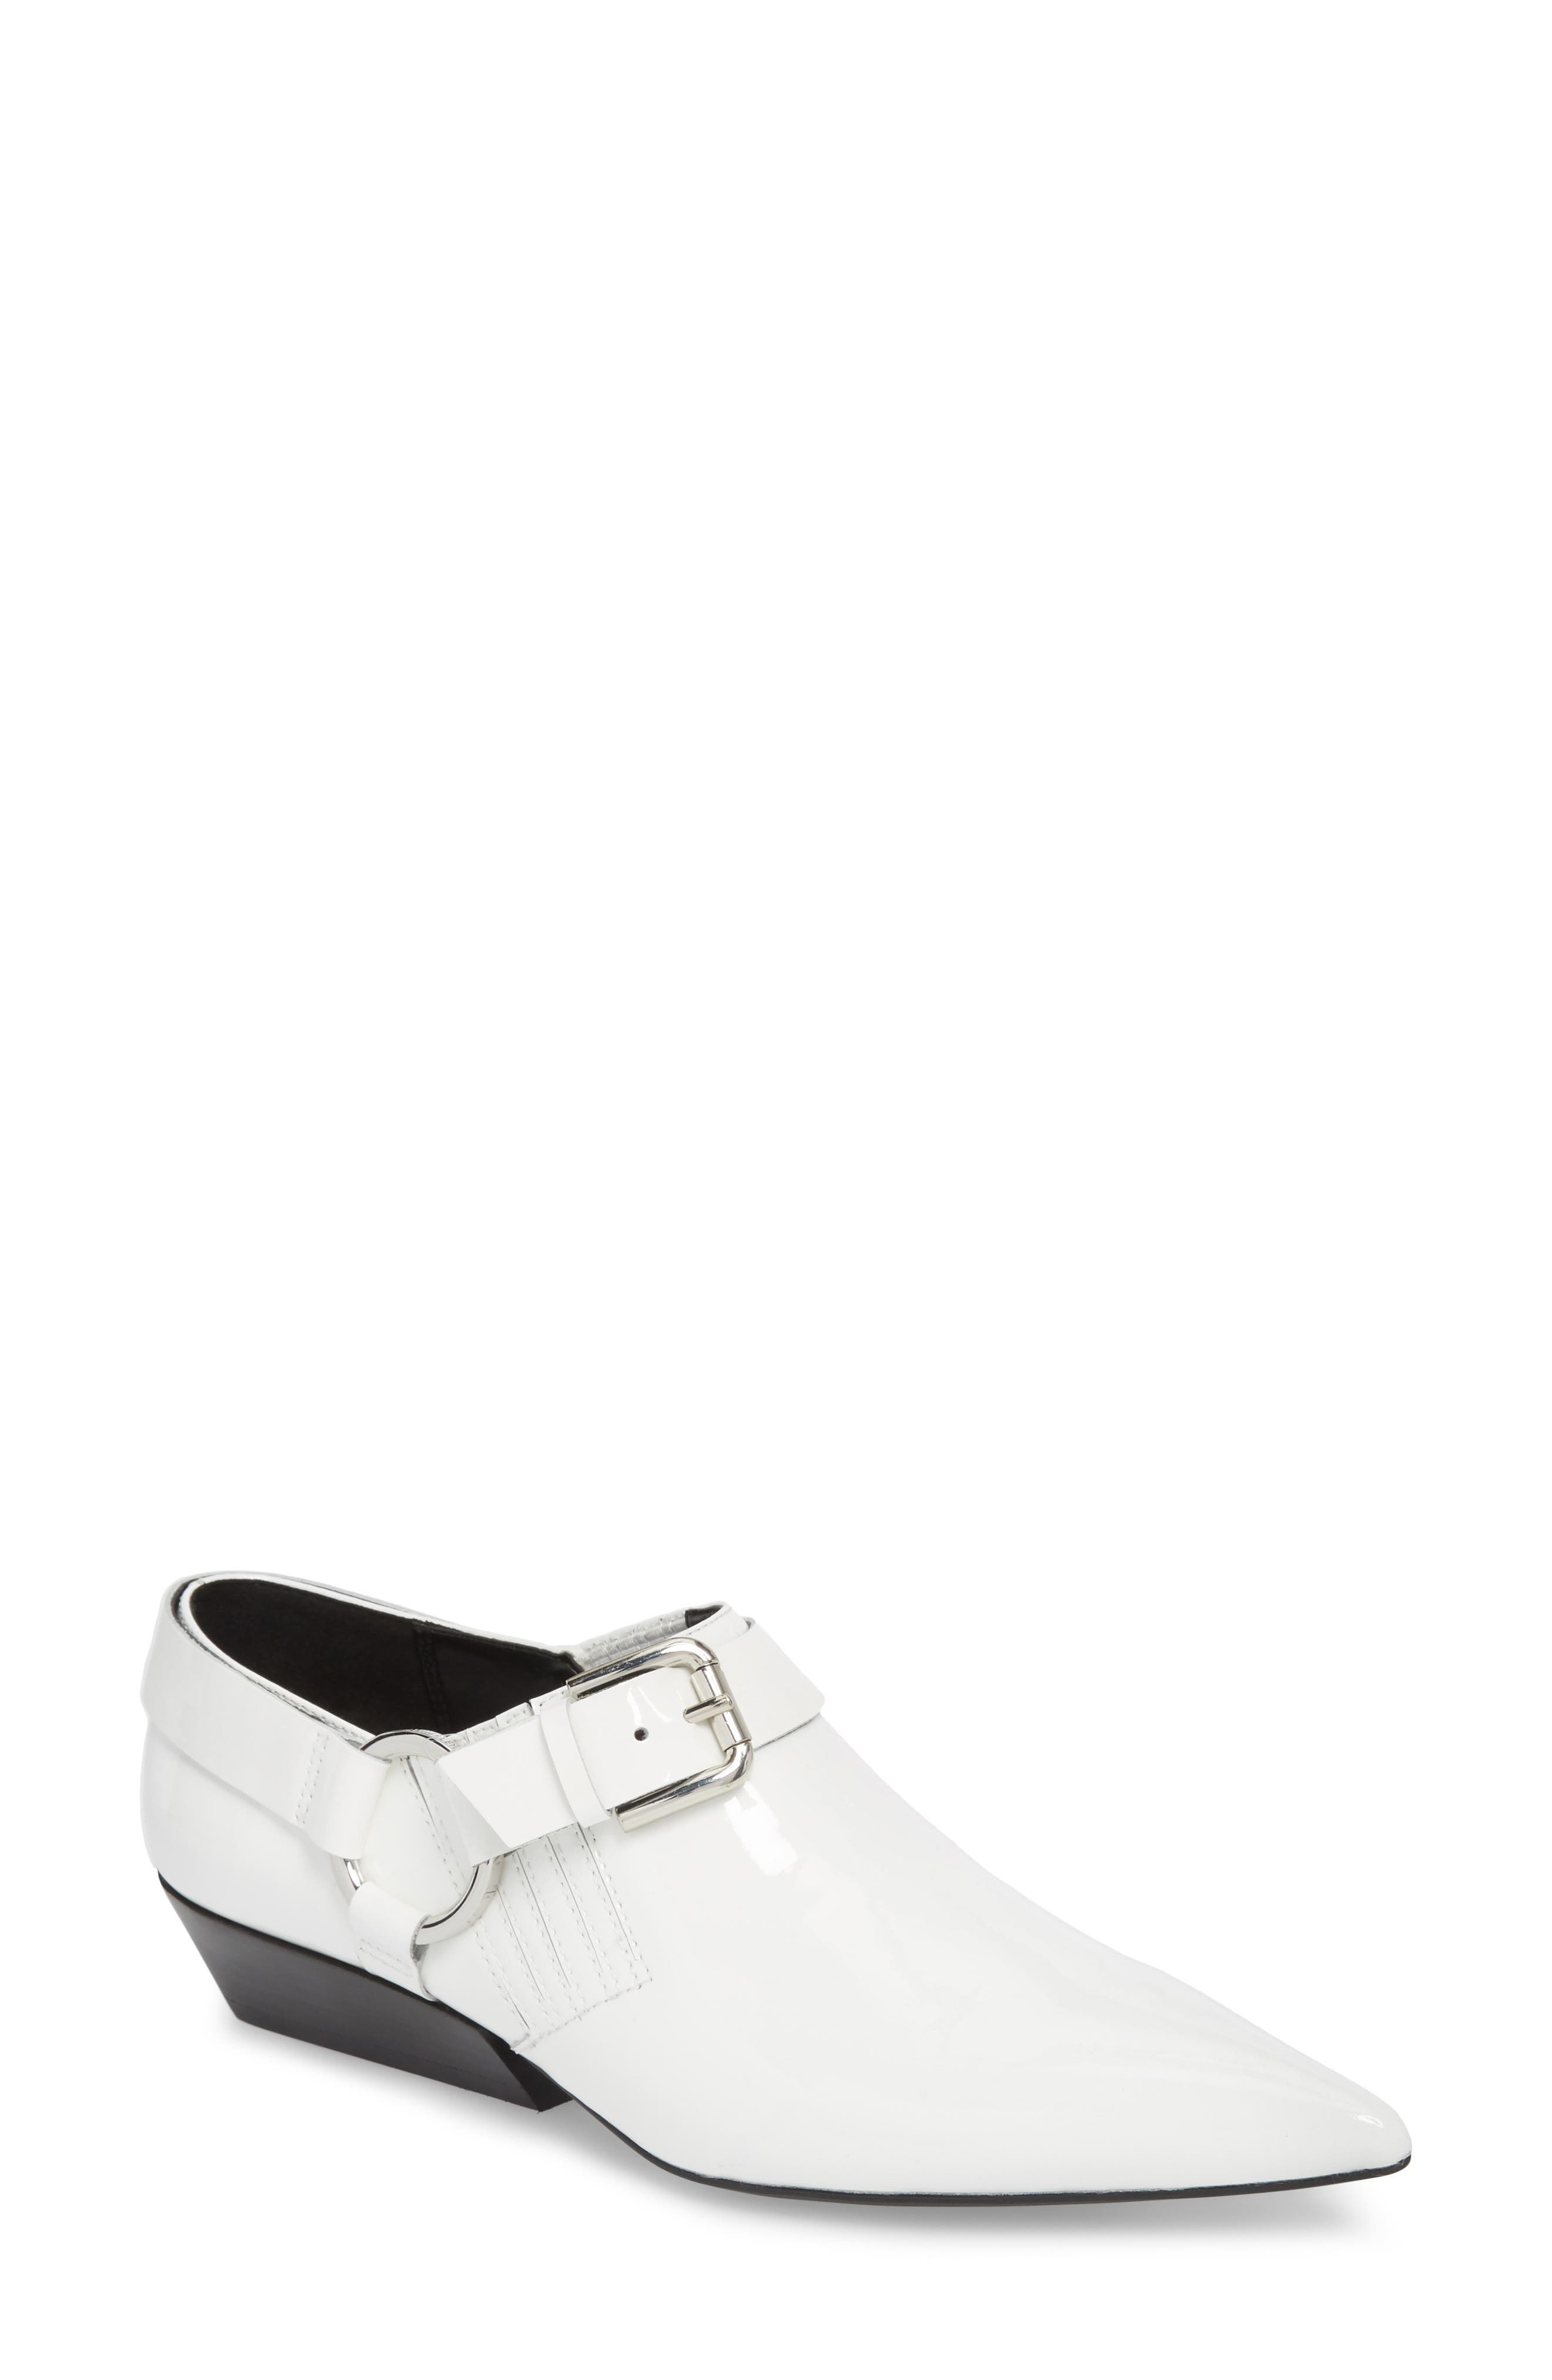 Calvin Klein Jeans Ellen Low Buckle Bootie, White